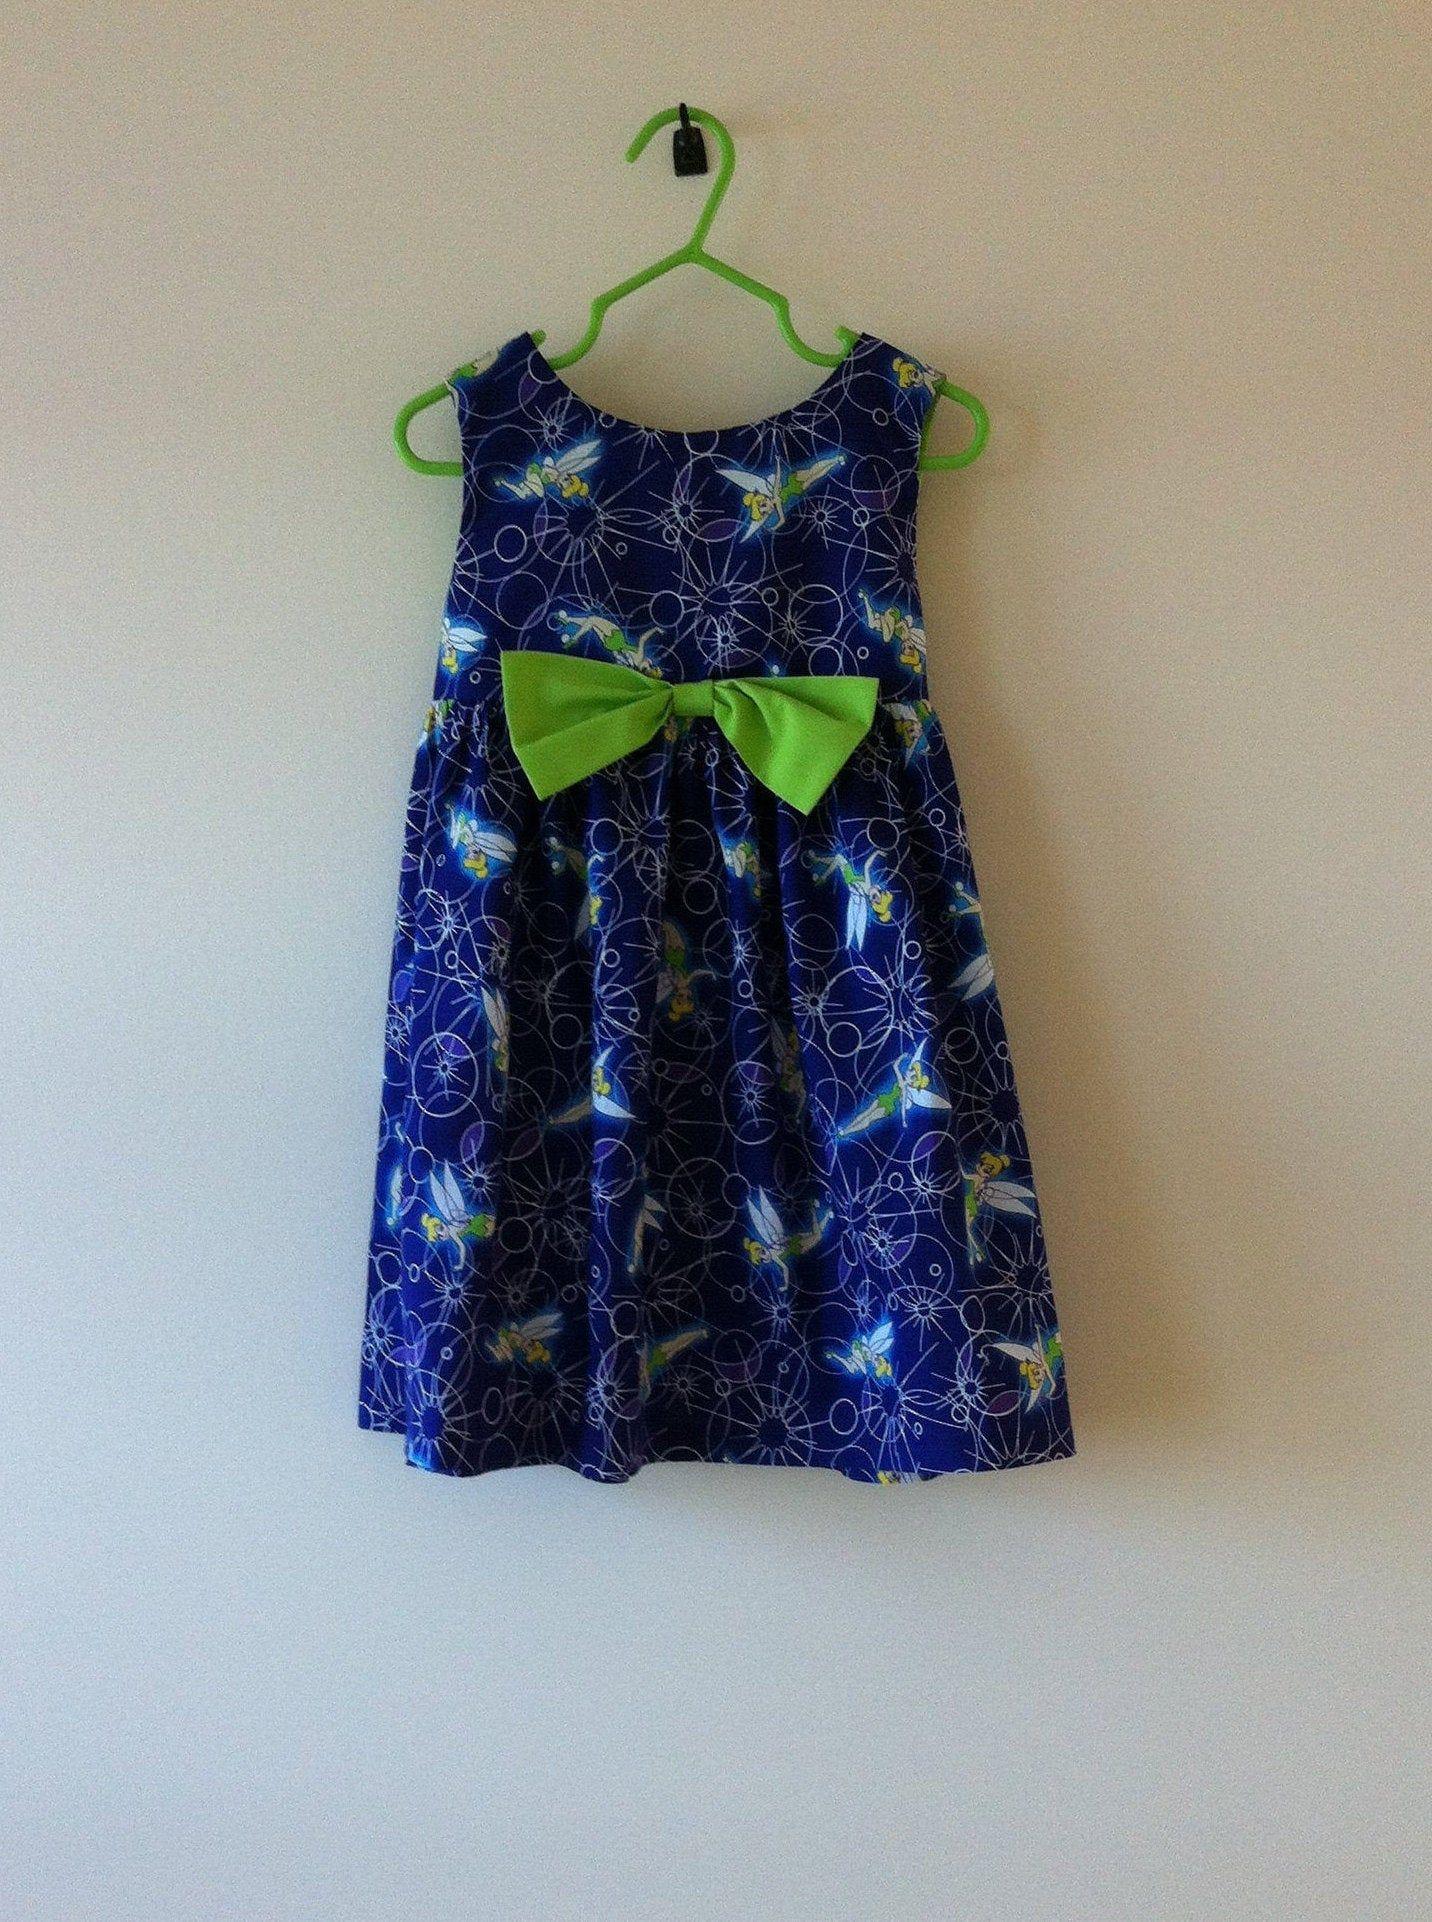 Girl S Blue Cotton Tinkerbell Dress Size 3 Toddler S Etsy Little Girl Dresses Dresses Tinkerbell Dress [ 1922 x 1432 Pixel ]